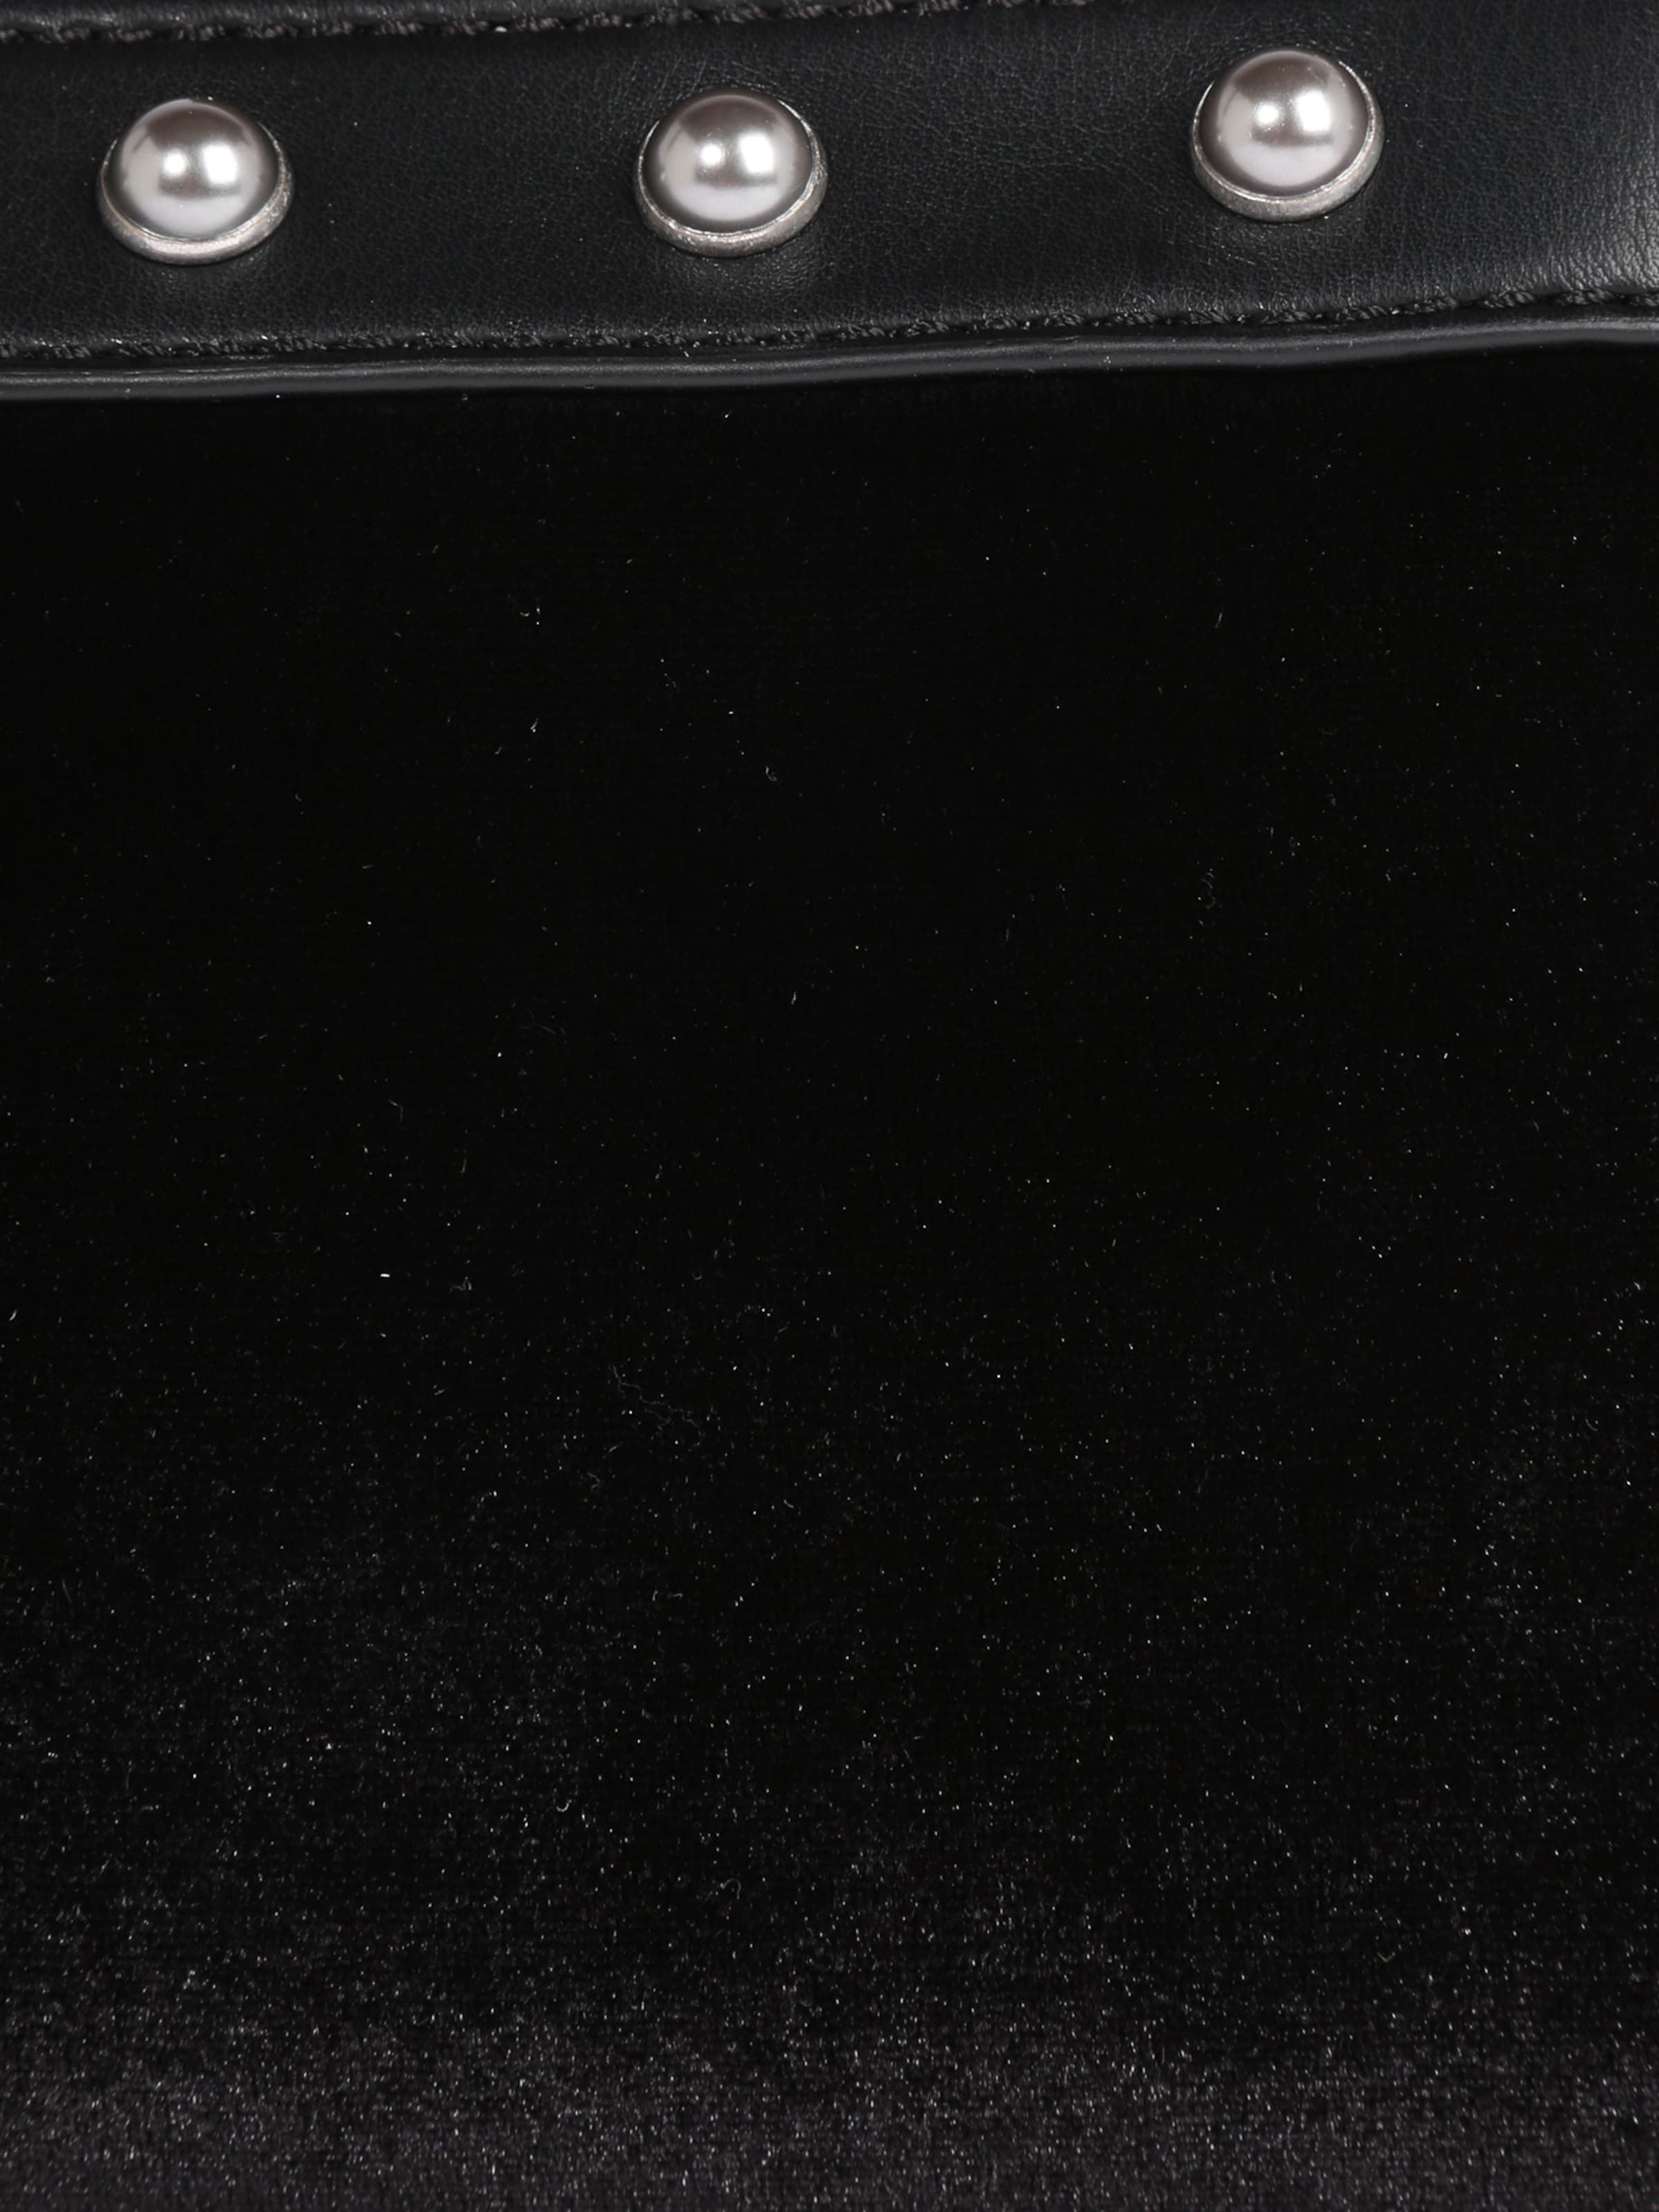 'Ayda baguette' ESPRIT 'Ayda baguette' ESPRIT baguette' Umh盲ngetasche Umh盲ngetasche Umh盲ngetasche ESPRIT 'Ayda ESPRIT Umh盲ngetasche qfxEB